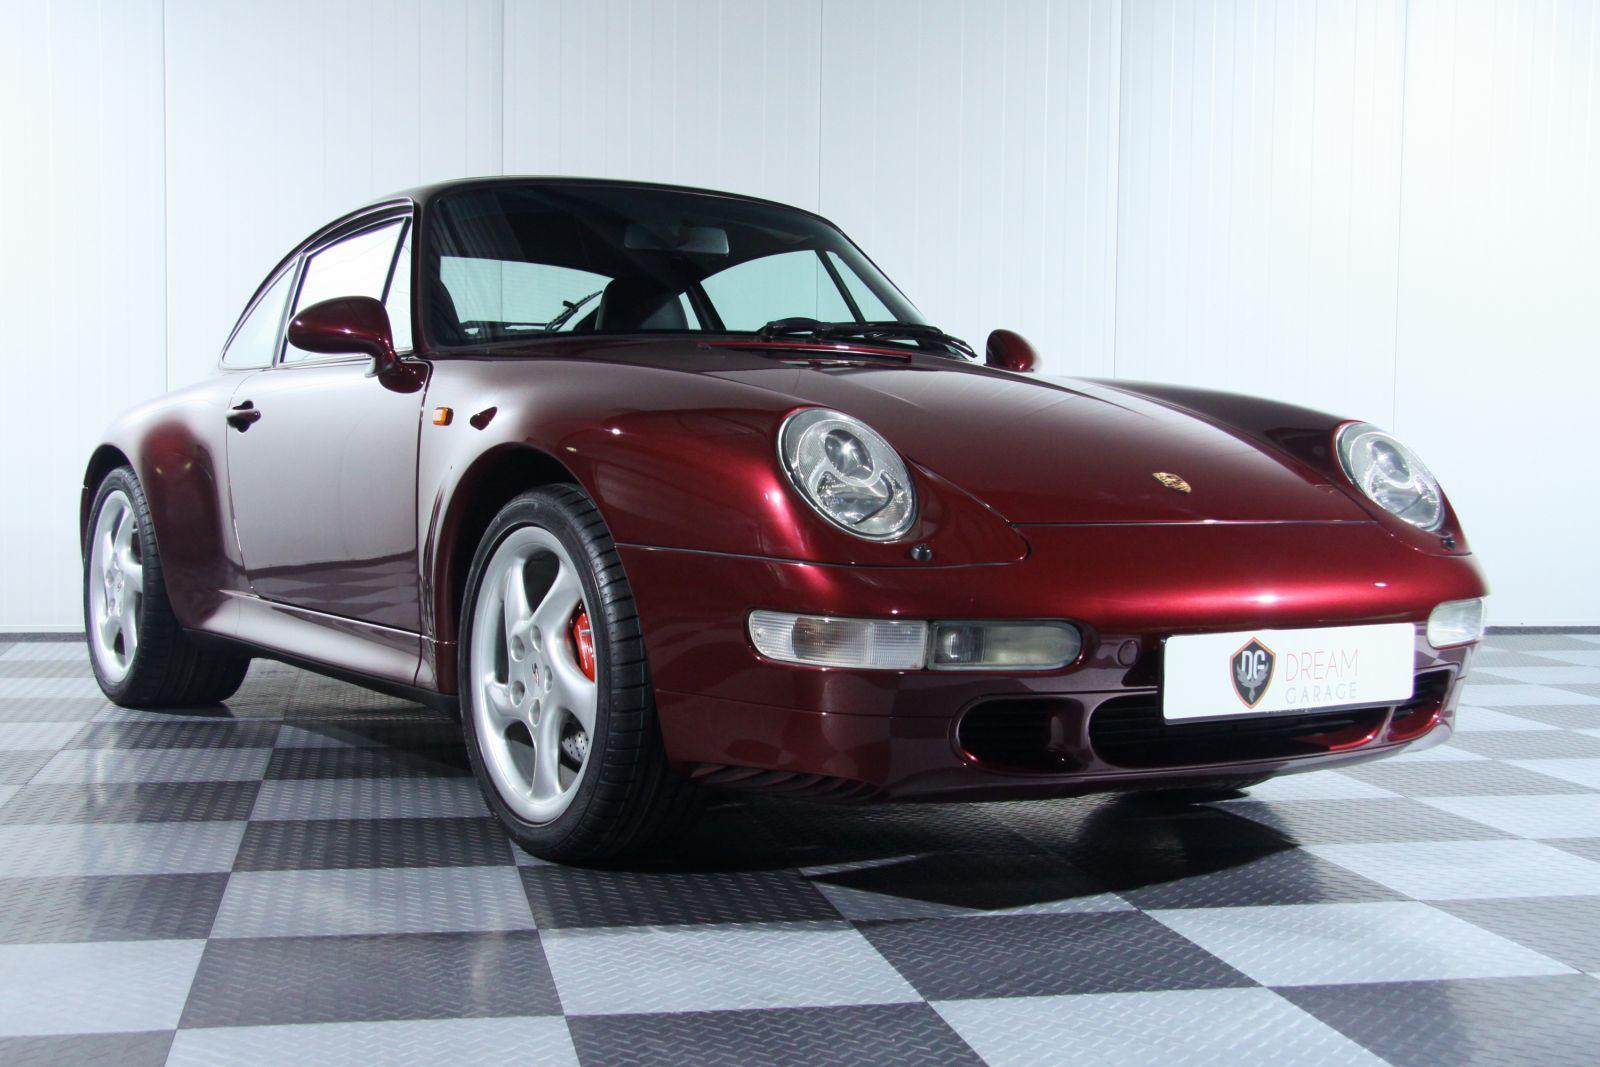 dream garage collectionporsche porsche 911 993 carrera. Black Bedroom Furniture Sets. Home Design Ideas